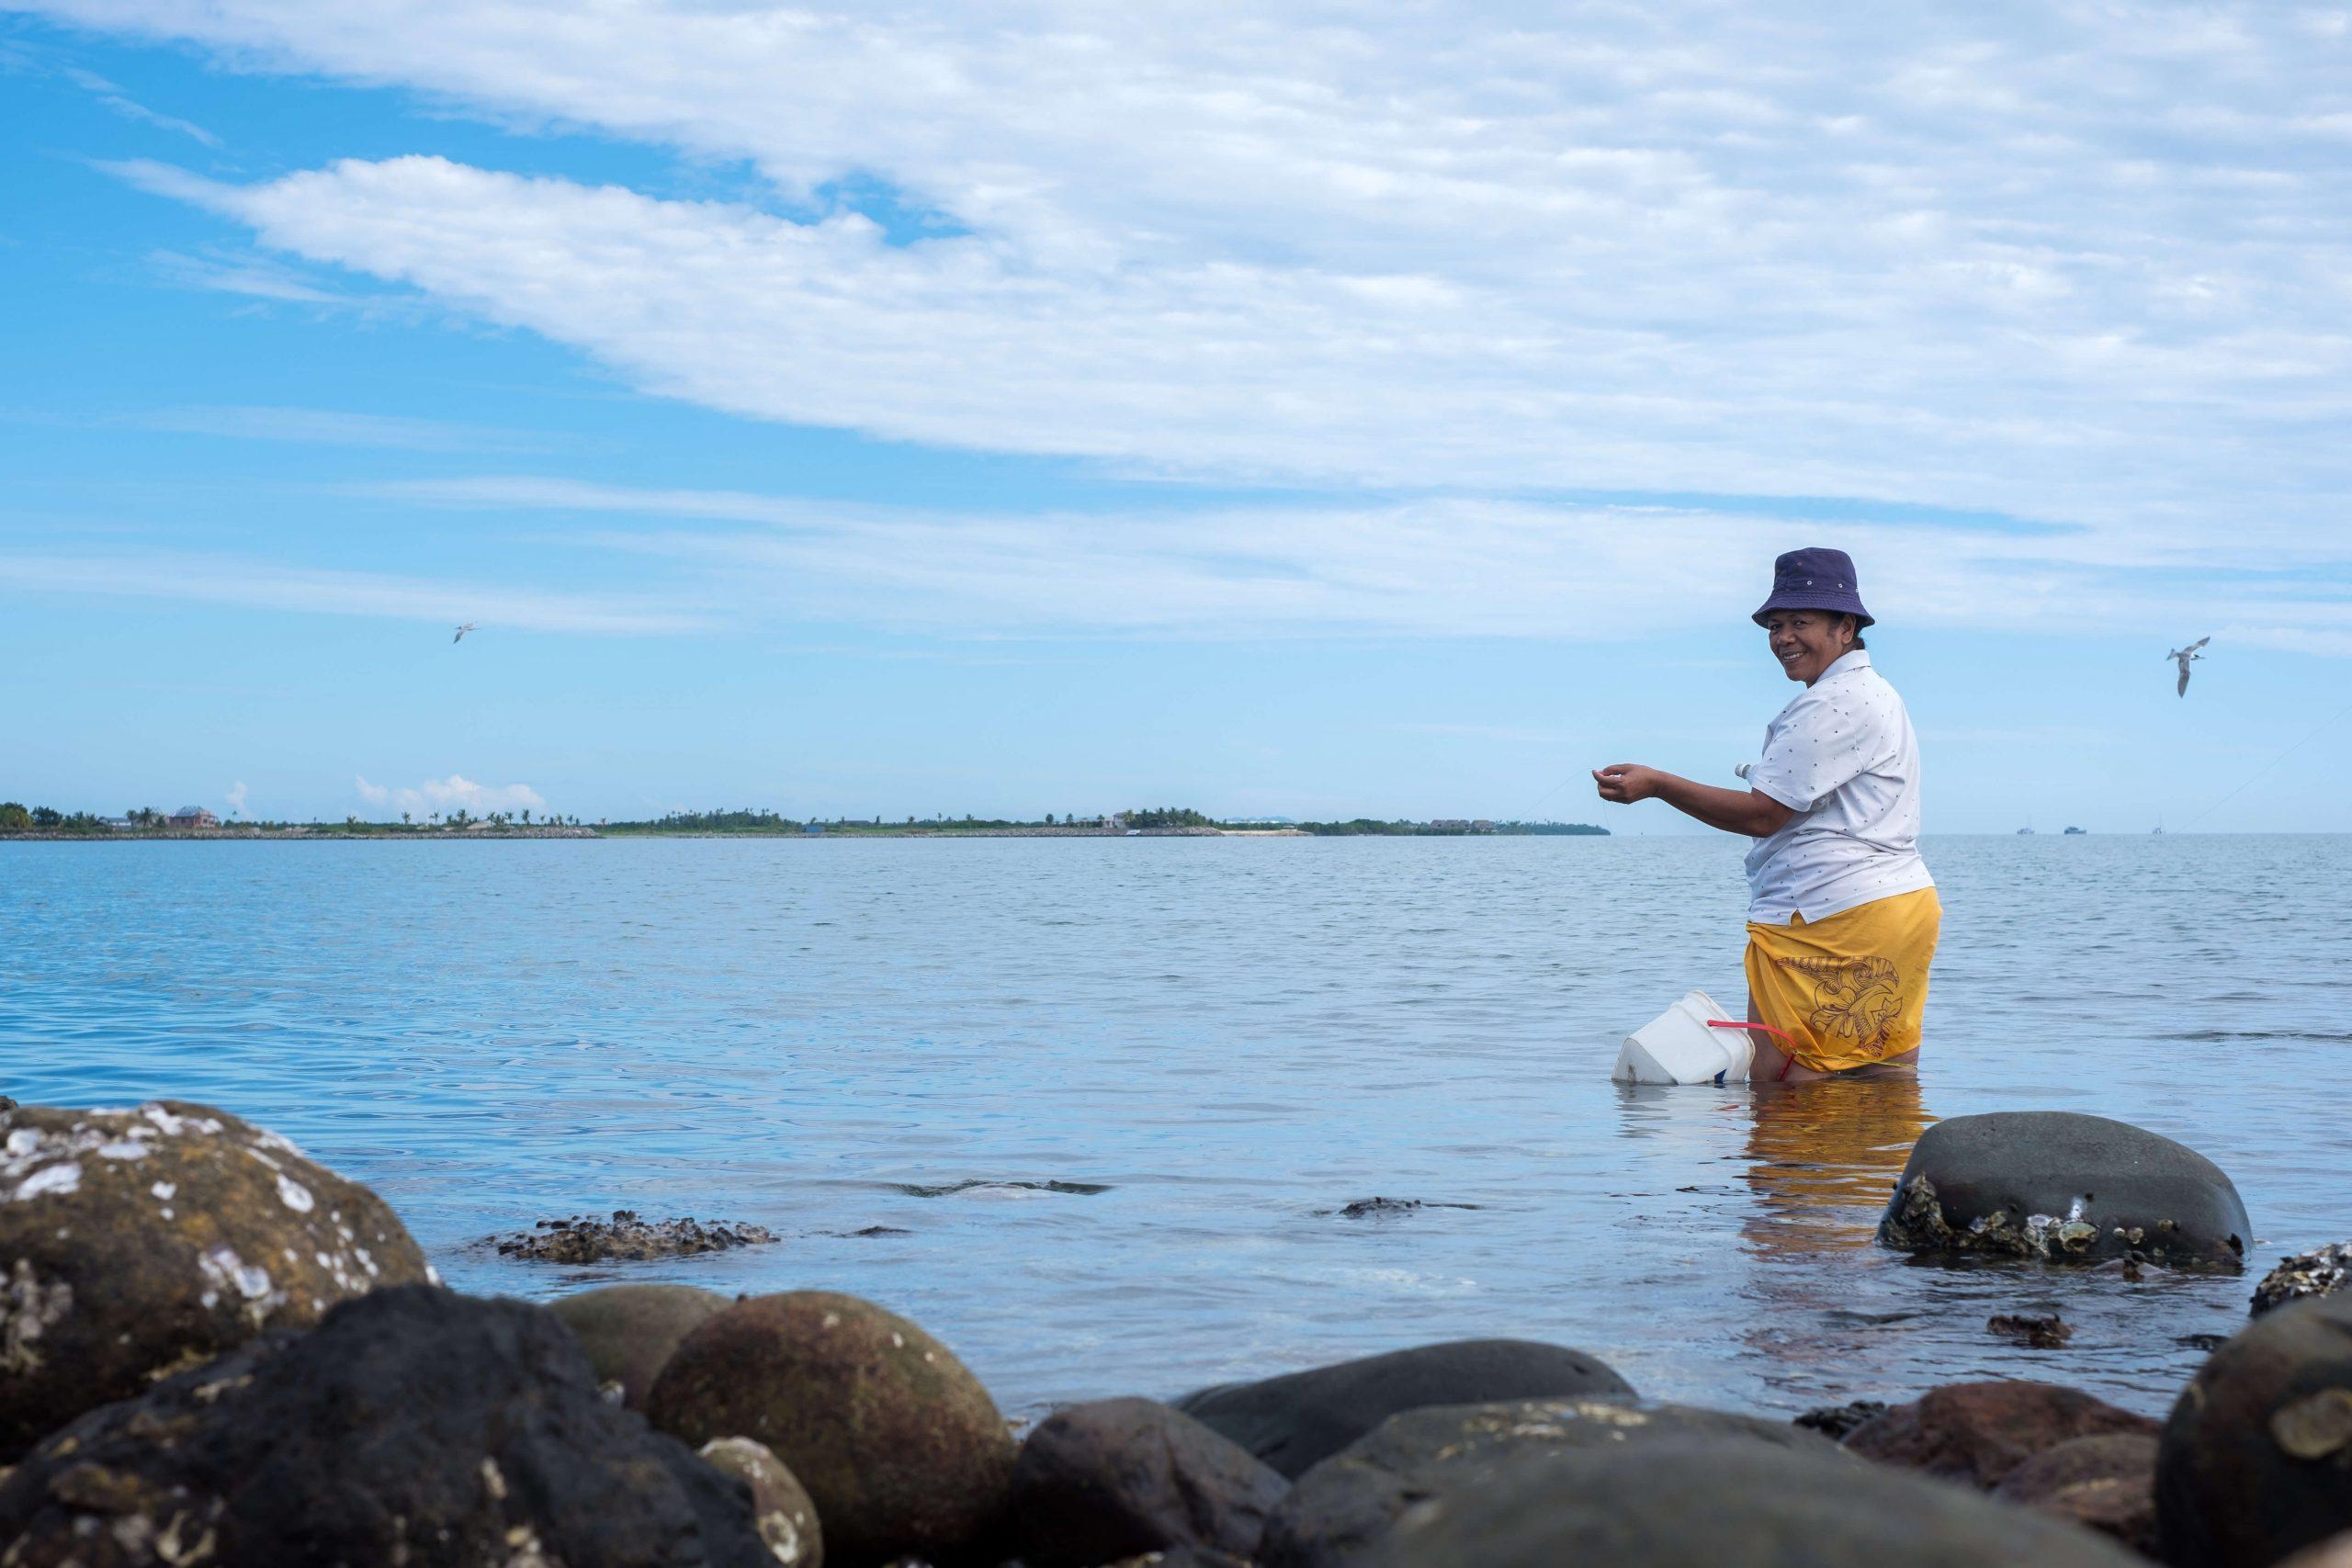 Pacific woman fishing